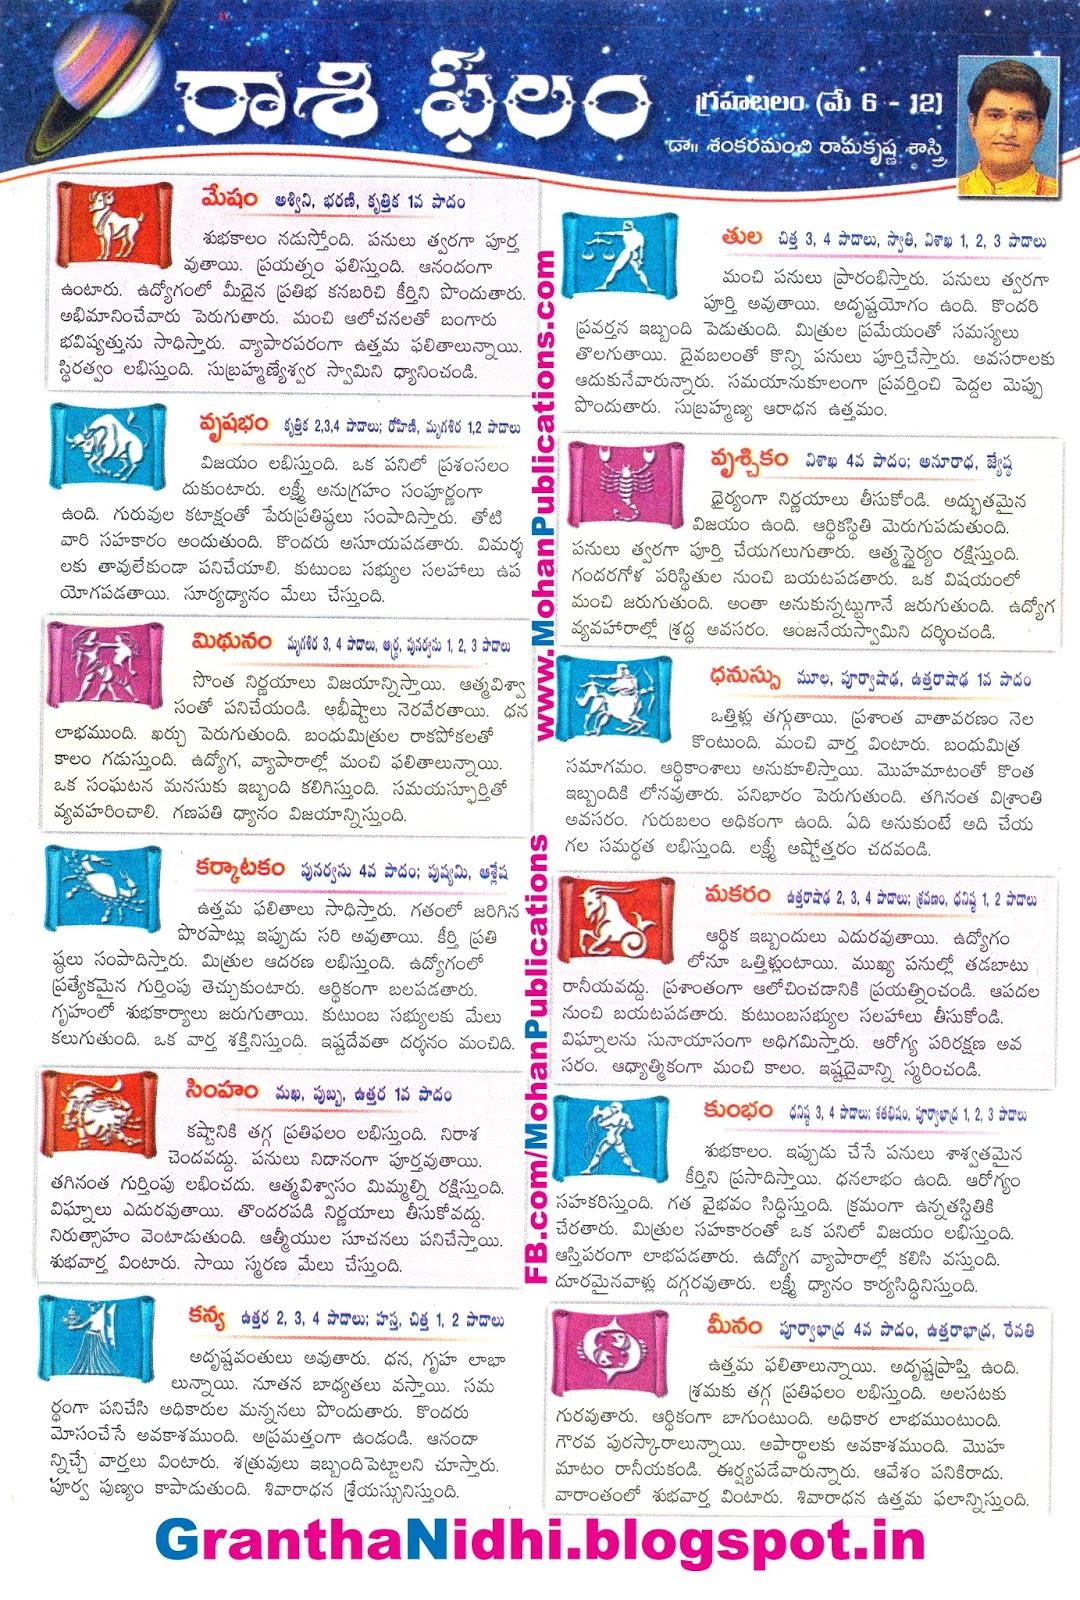 bhakti pustakalu bhaktipustakalu sankaramanchi ramakrishna sastry rasi phalalu weekly sankaramanchi ramakrishna Grahabalam bhakthi pustakalu bhakti pustakalu bhakthipustakalu bhaktipustakalu RasiPhalalu Sunday-Magazine Eenadu.net EenaduEpaper EenaduSunday మేషం (అశ్విని, భరణి, కృత్తిక 1వ పాదం) వృషభం (కృత్తిక 2,3,4 పాదాలు; రోహిణి, మృగశిర 1,2 పాదాలు) మిథునం  (మృగశిర 3, 4 పాదాలు, ఆర్ద్ర, పునర్వసు 1, 2, 3 పాదాలు) కర్కాటకం (పునర్వసు 4వ పాదం; పుష్యమి, ఆశ్లేష) సింహం (మఖ, పుబ్బ, ఉత్తర 1వ పాదం) కన్య   (ఉత్తర 2, 3, 4 పాదాలు; హస్త, చిత్త 1, 2 పాదాలు) తుల (చిత్త 3, 4 పాదాలు, స్వాతి, విశాఖ 1, 2, 3 పాదాలు) వృశ్చికం (విశాఖ 4వ పాదం; అనూరాధ, జ్యేష్ఠ) ధనుస్సు (మూల, పూర్వాషాఢ, ఉత్తరాషాఢ 1వ పాదం) మకరం  (ఉత్తరాషాఢ 2, 3, 4 పాదాలు; శ్రవణం, ధనిష్ట 1, 2 పాదాలు) కుంభం (ధనిష్ట 3, 4 పాదాలు; శతభిషం, పూర్వాభాద్ర 1, 2, 3 పాదాలు) మీనం (పూర్వాభాద్ర 4వ పాదం, ఉత్తరాభాద్ర, రేవతి)